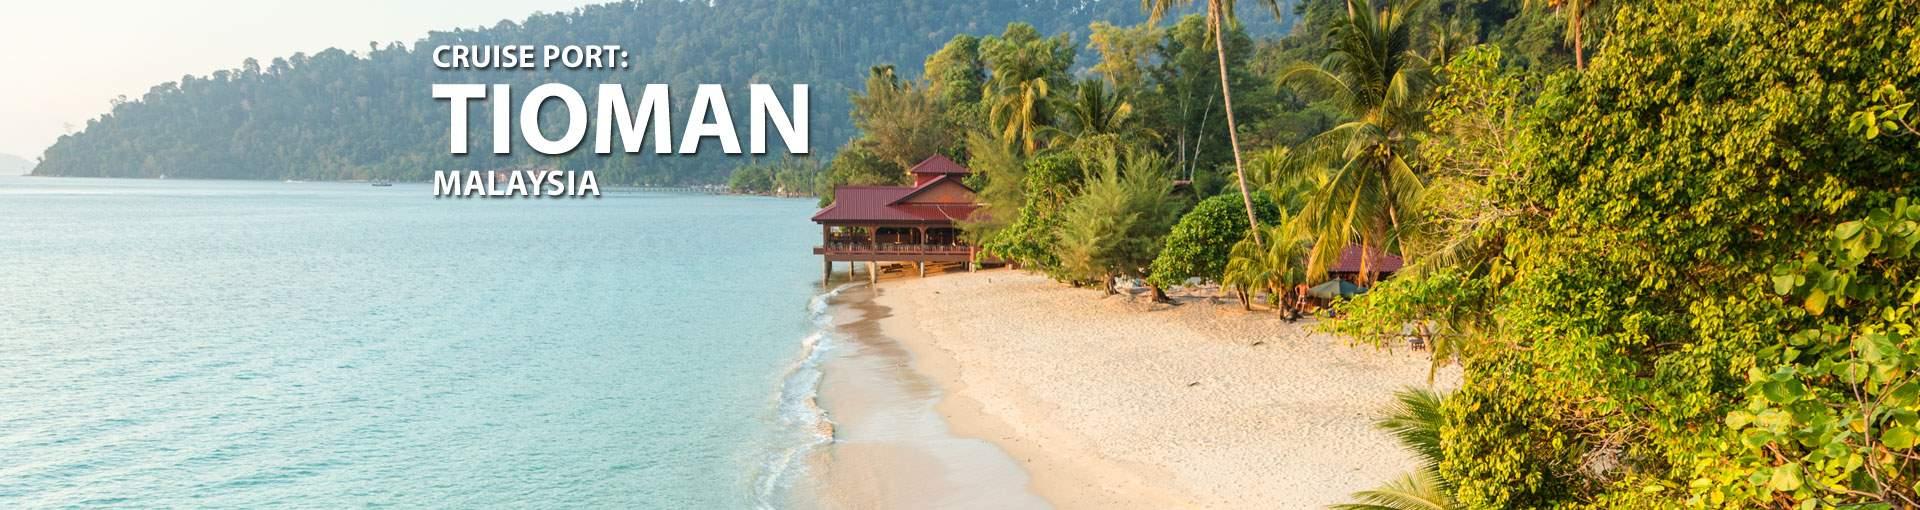 Cruises to Tioman, Malaysia